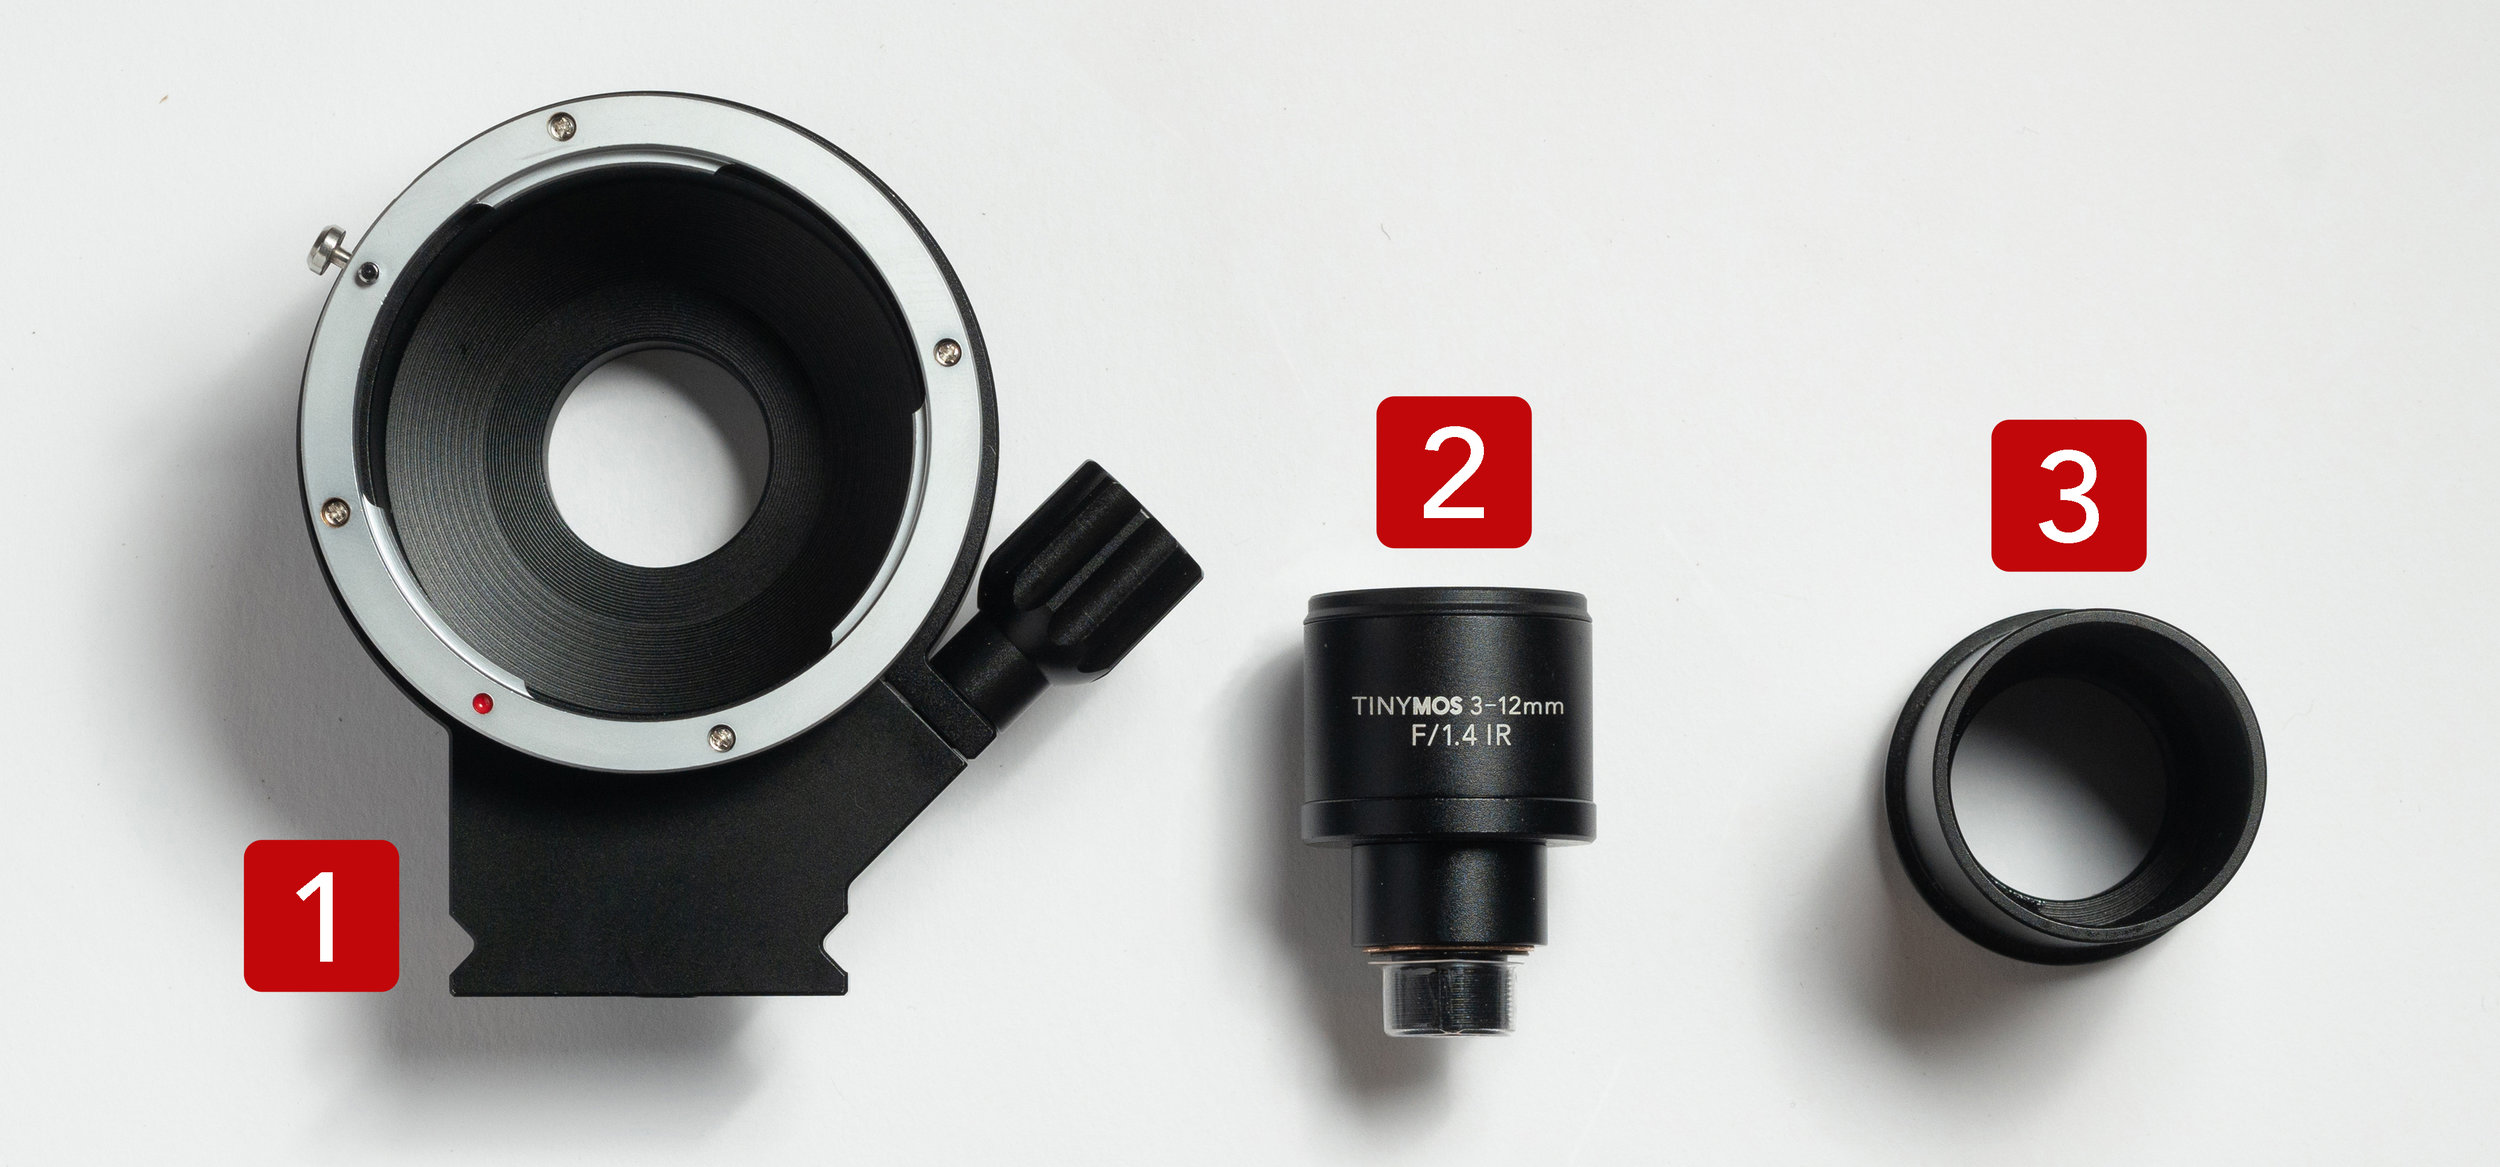 1. DSLR adapter | 2. 3-12mm f/1.4 M12 lens | 3. Telescope adapter